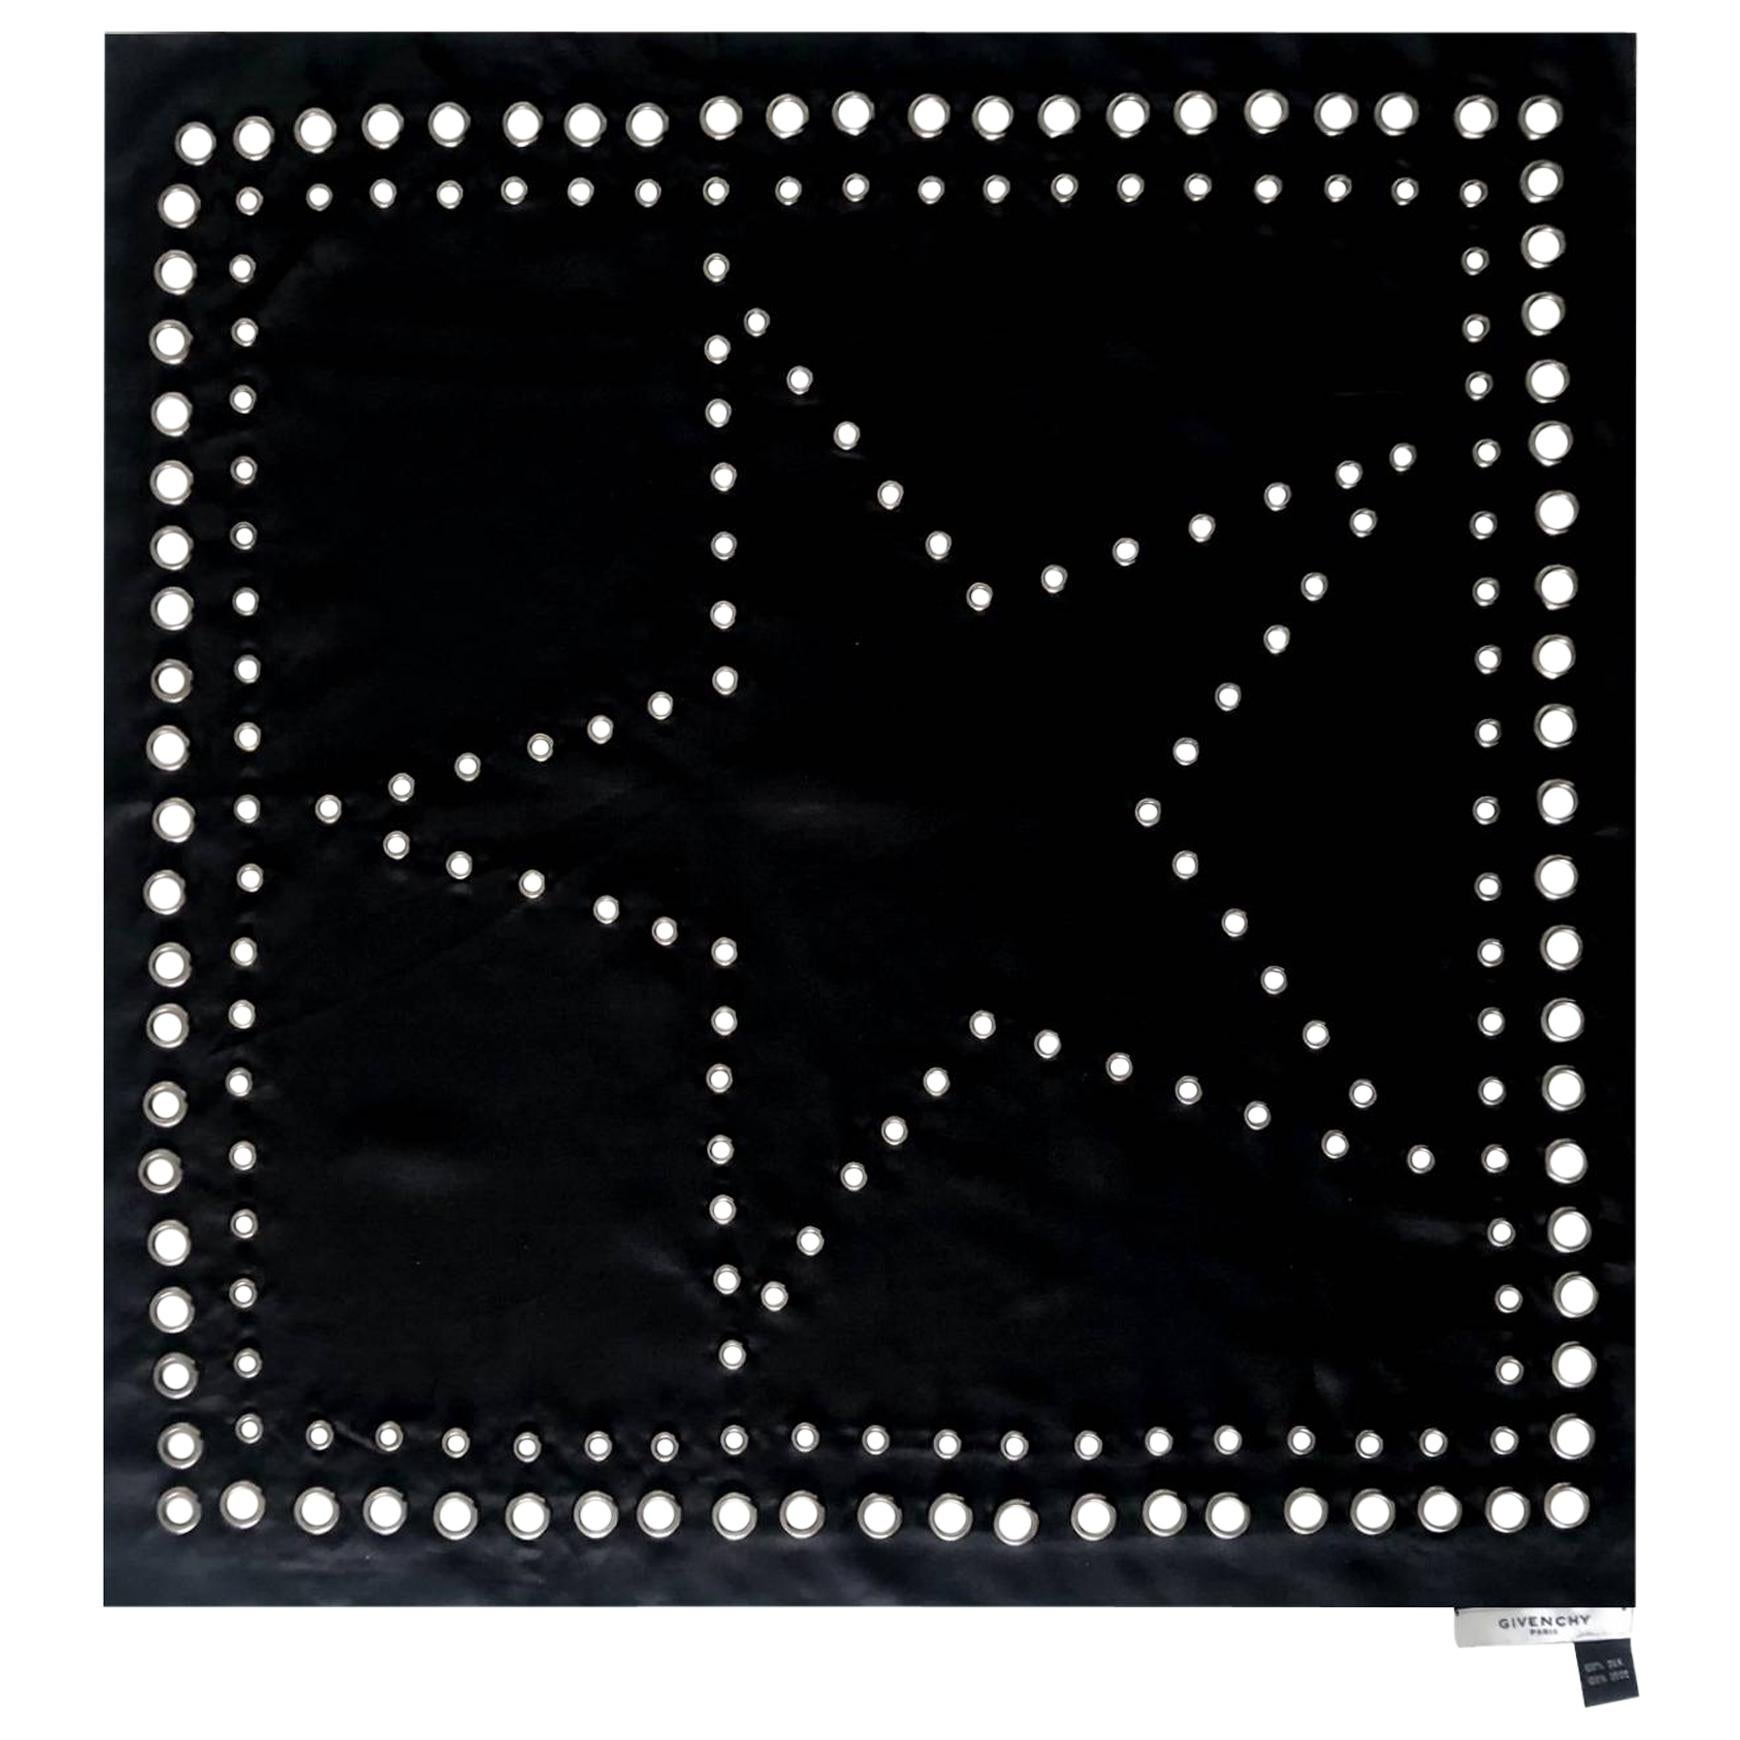 2000s Givenchy Black Studded Star Silk Scarf